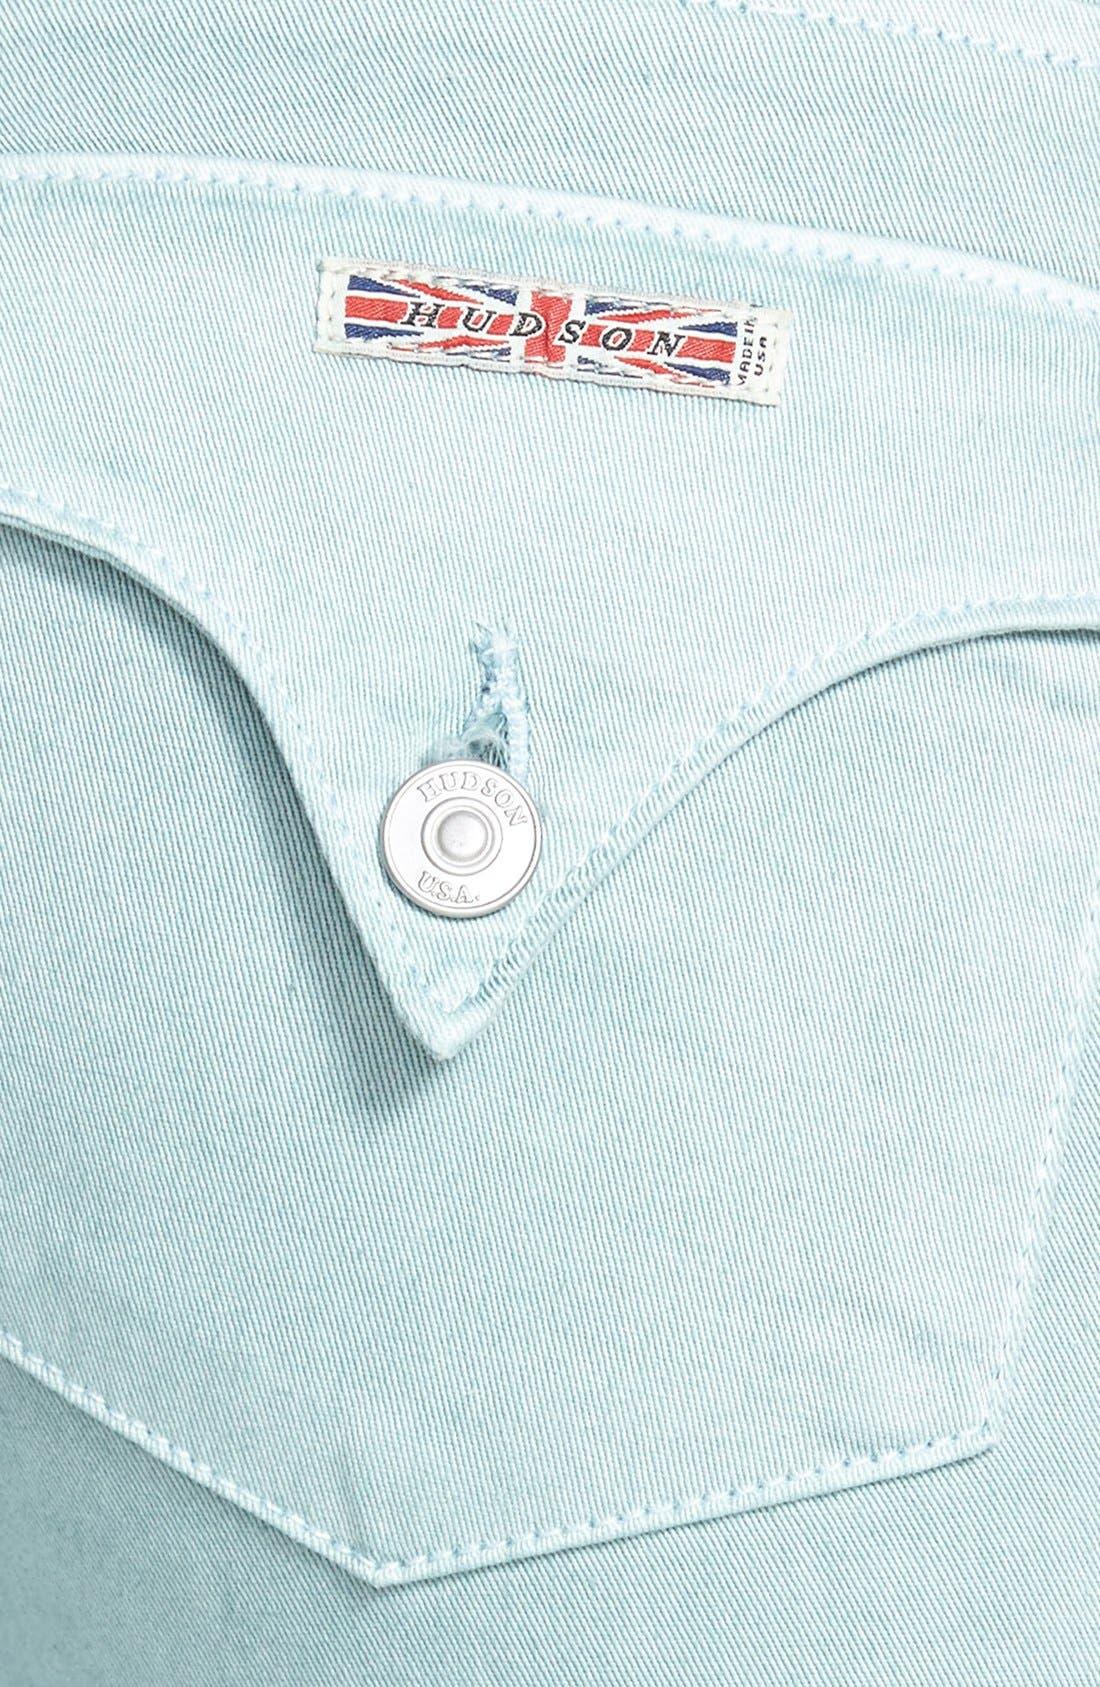 Alternate Image 3  - Hudson Jeans 'Collin' Crop Skinny Jeans (Dusty Pistachio)